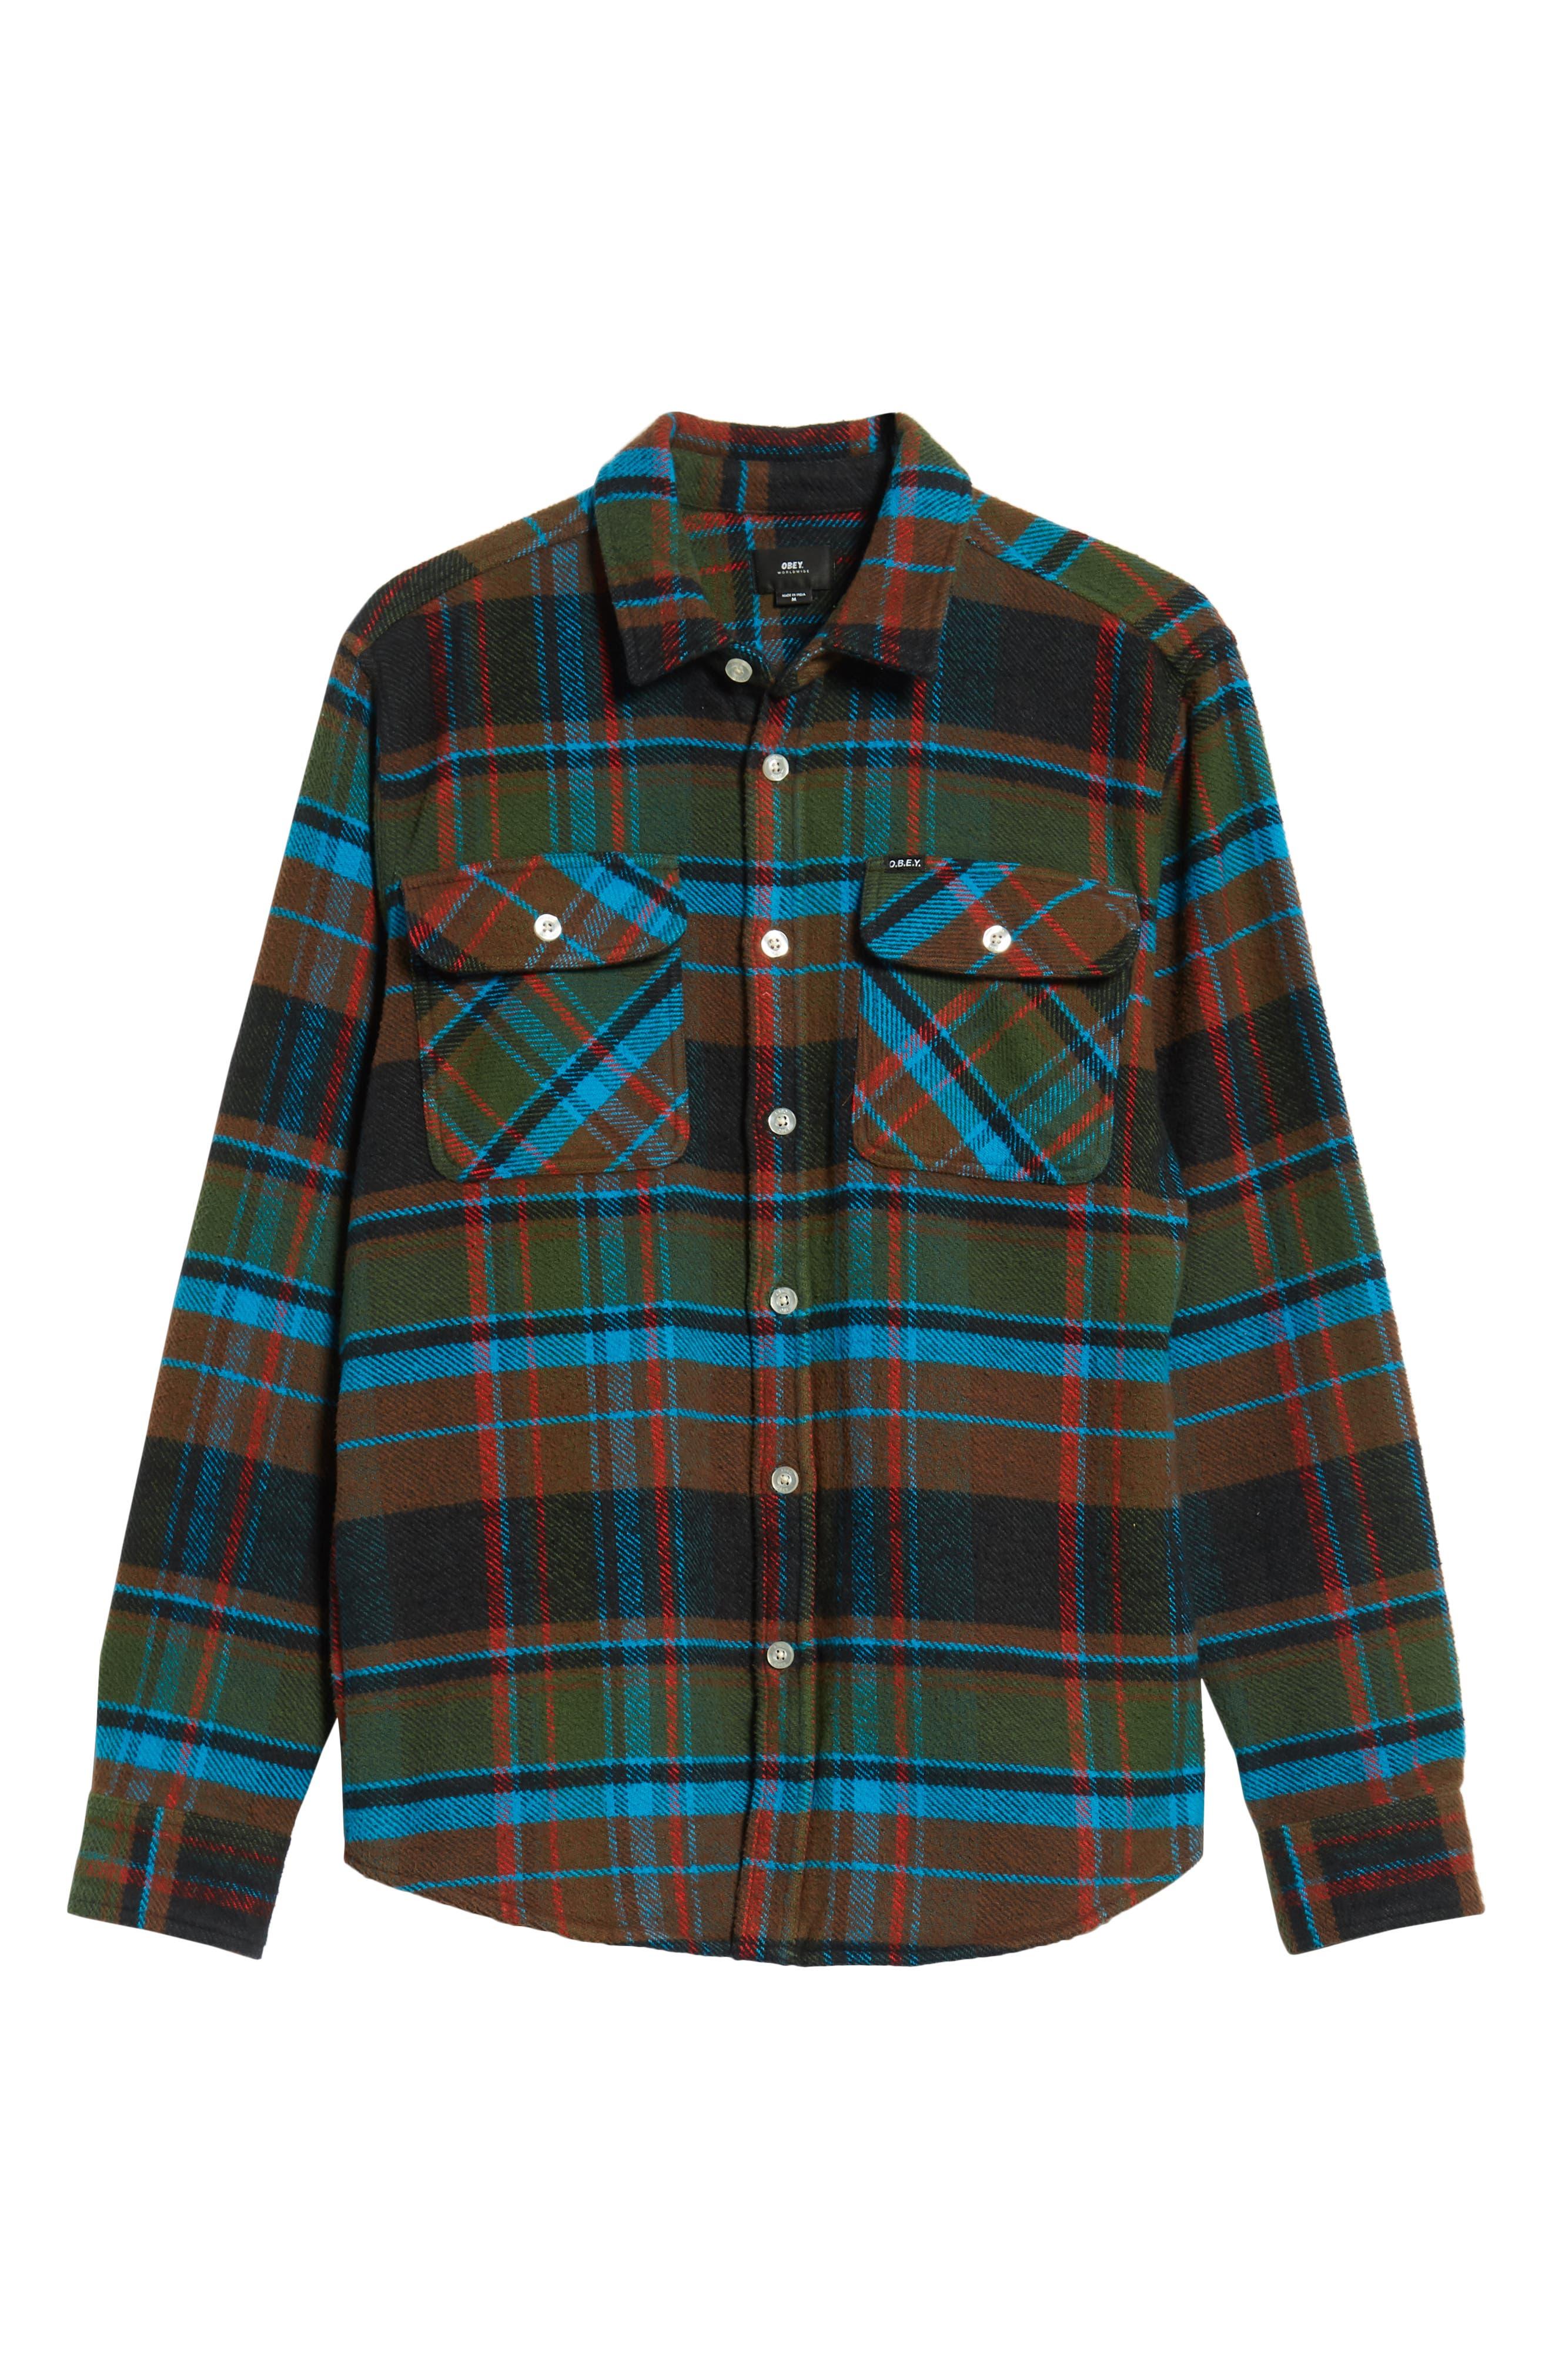 Homebound Heavy Plaid Flannel Shirt Jacket,                             Alternate thumbnail 5, color,                             BLACK FORREST MULTI